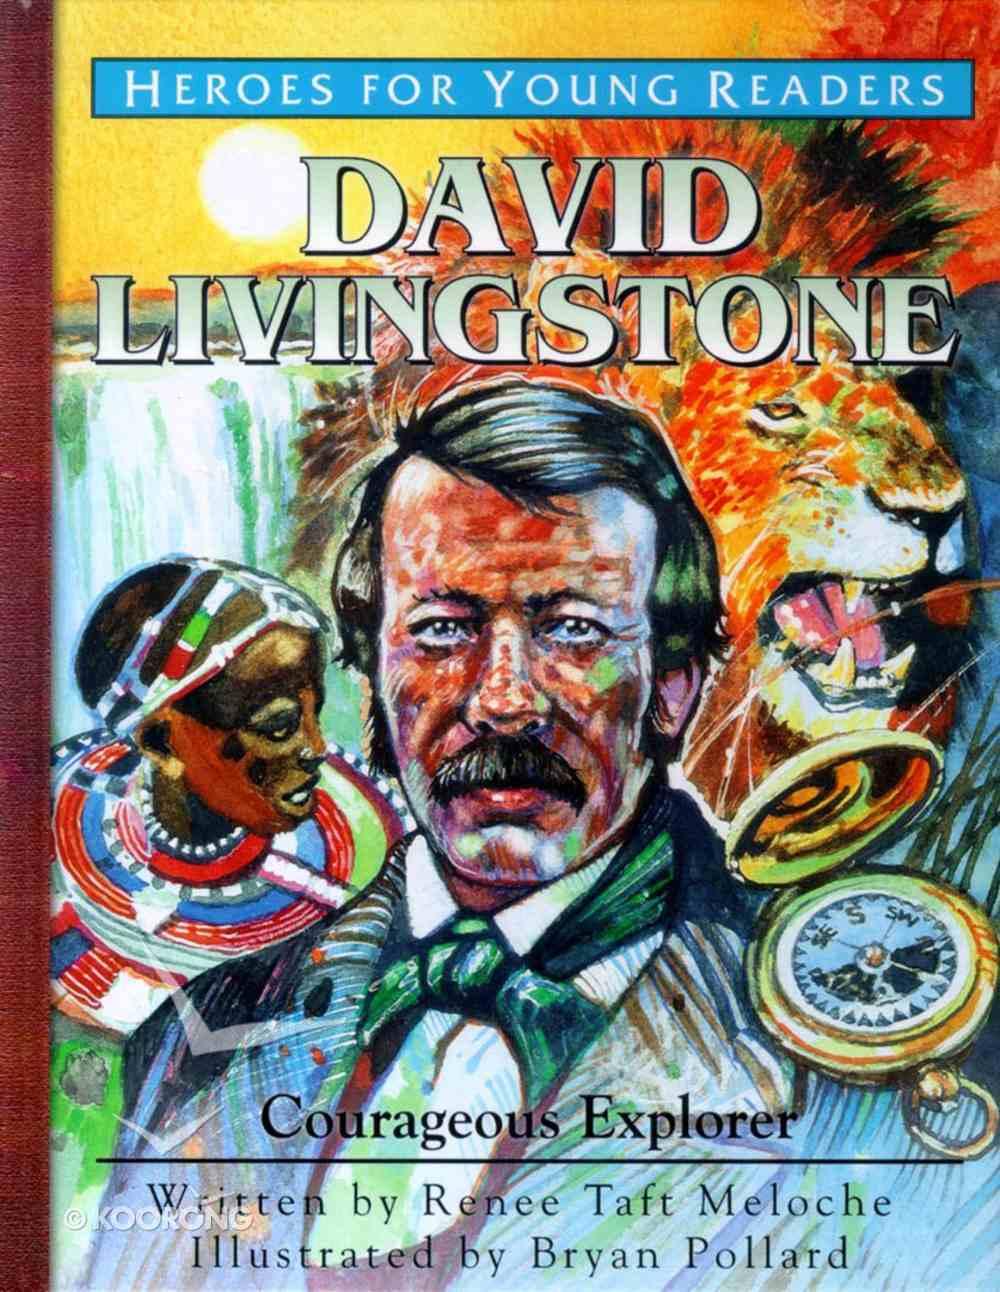 David Livingstone - Courageous Explorer (Heroes For Young Readers Series) Hardback